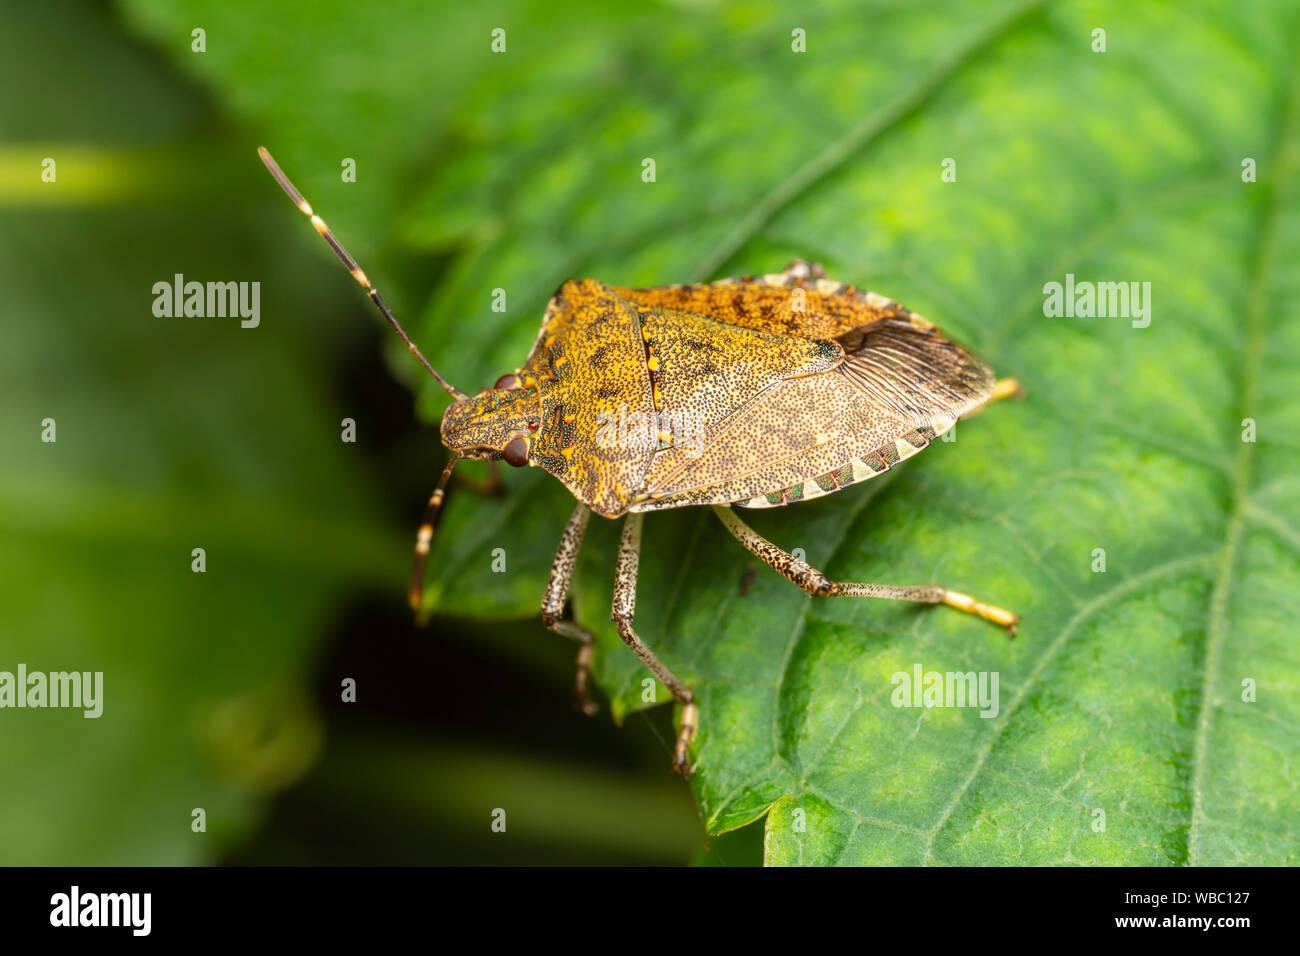 Brown Marmorated Stink Bug (Halyomorpha halys) Stock Photo